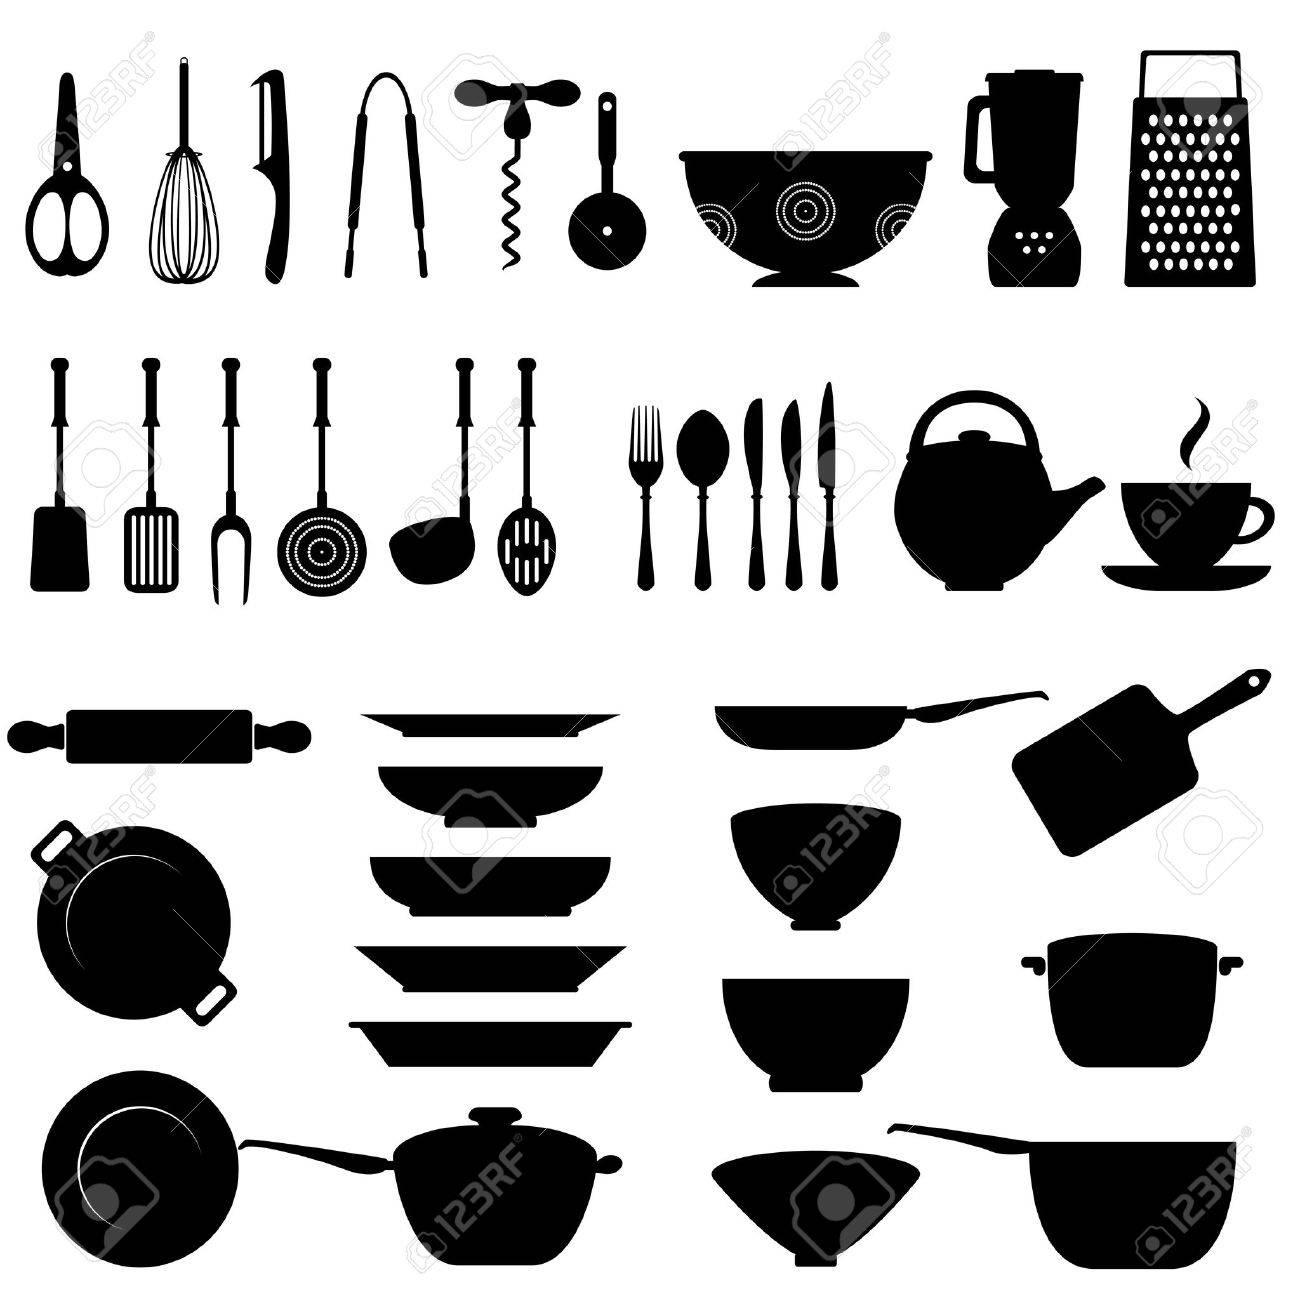 utensili da cucina e set di icone strumento clipart royalty-free ... - Arnesi Da Cucina